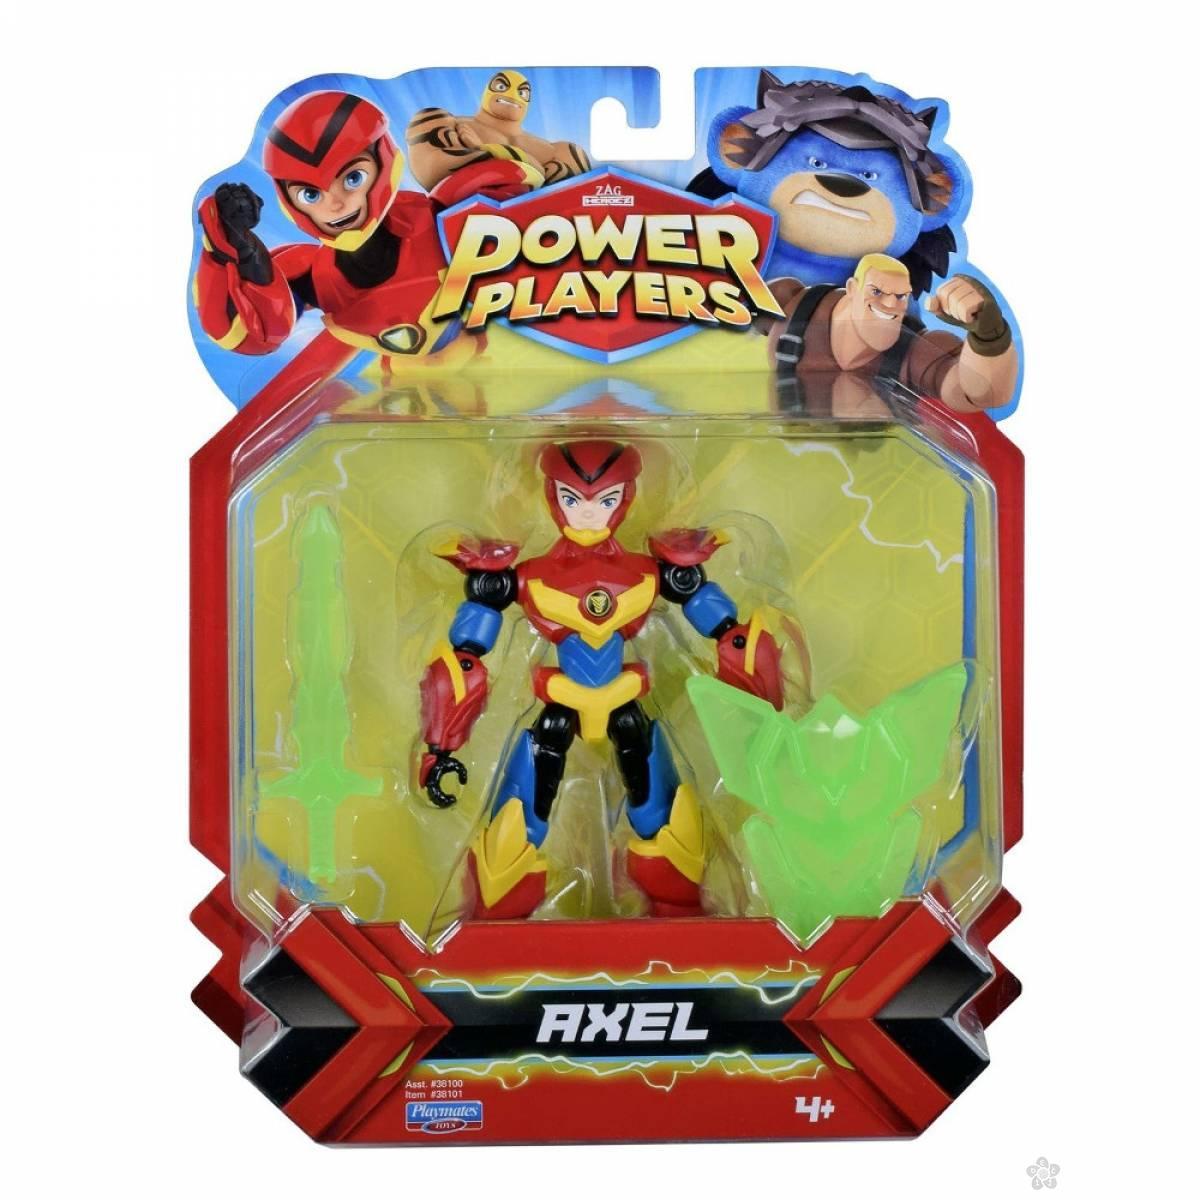 Akciona figrura Power Players Axel 38151